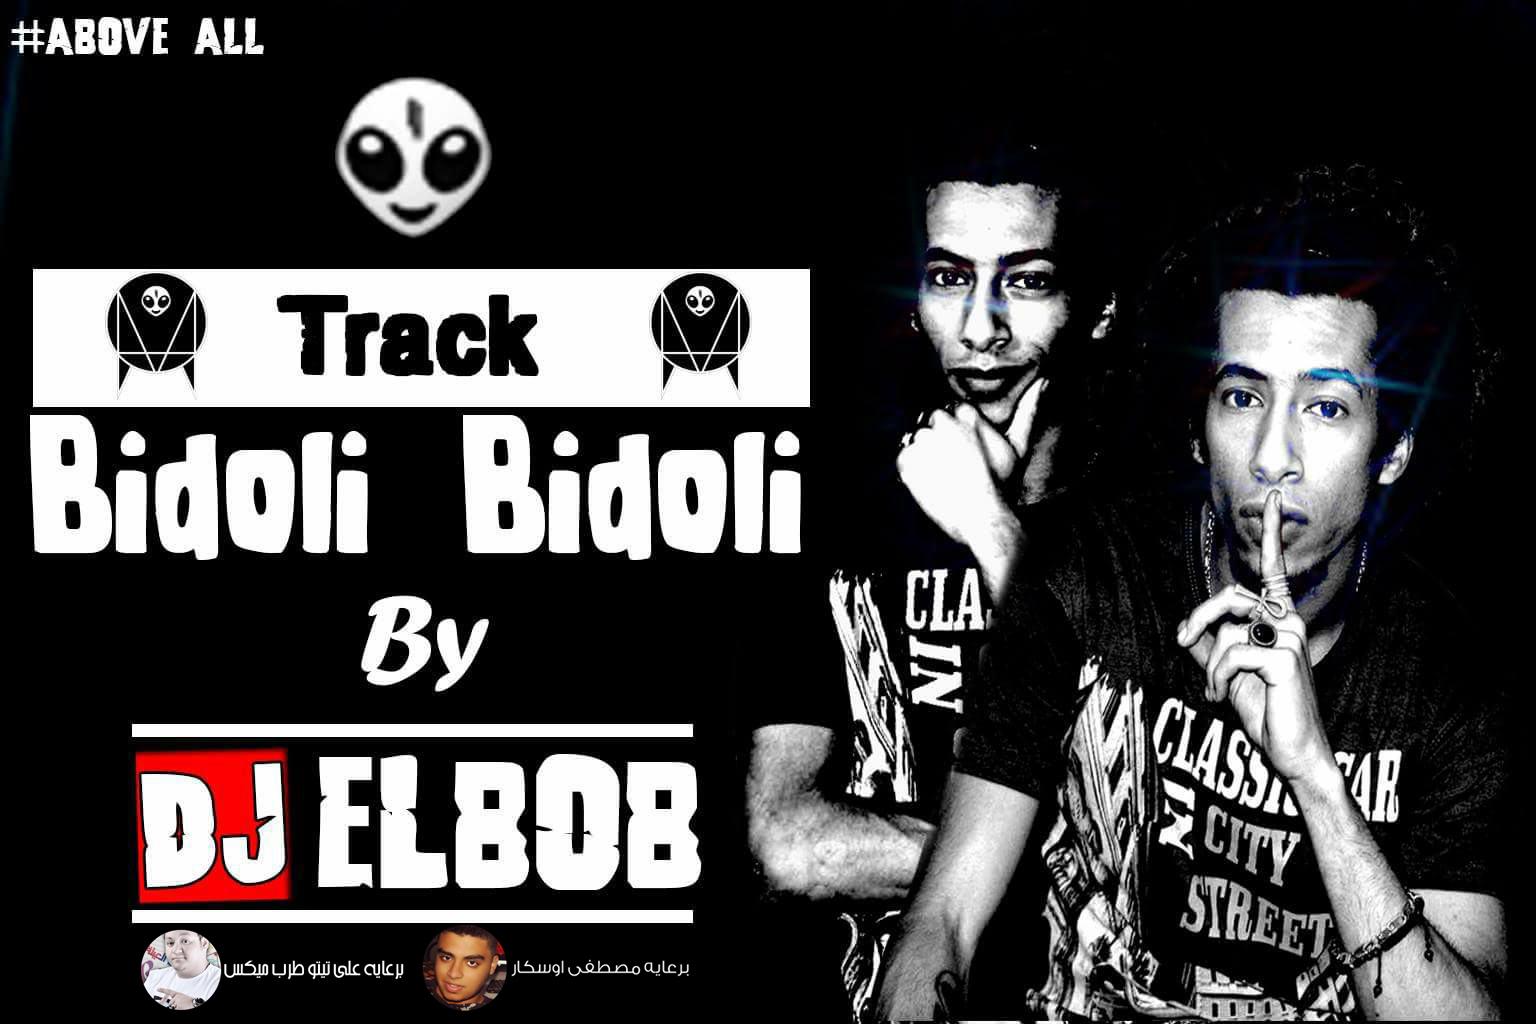 track Bidoli Bidoli Dj Elbob Remix